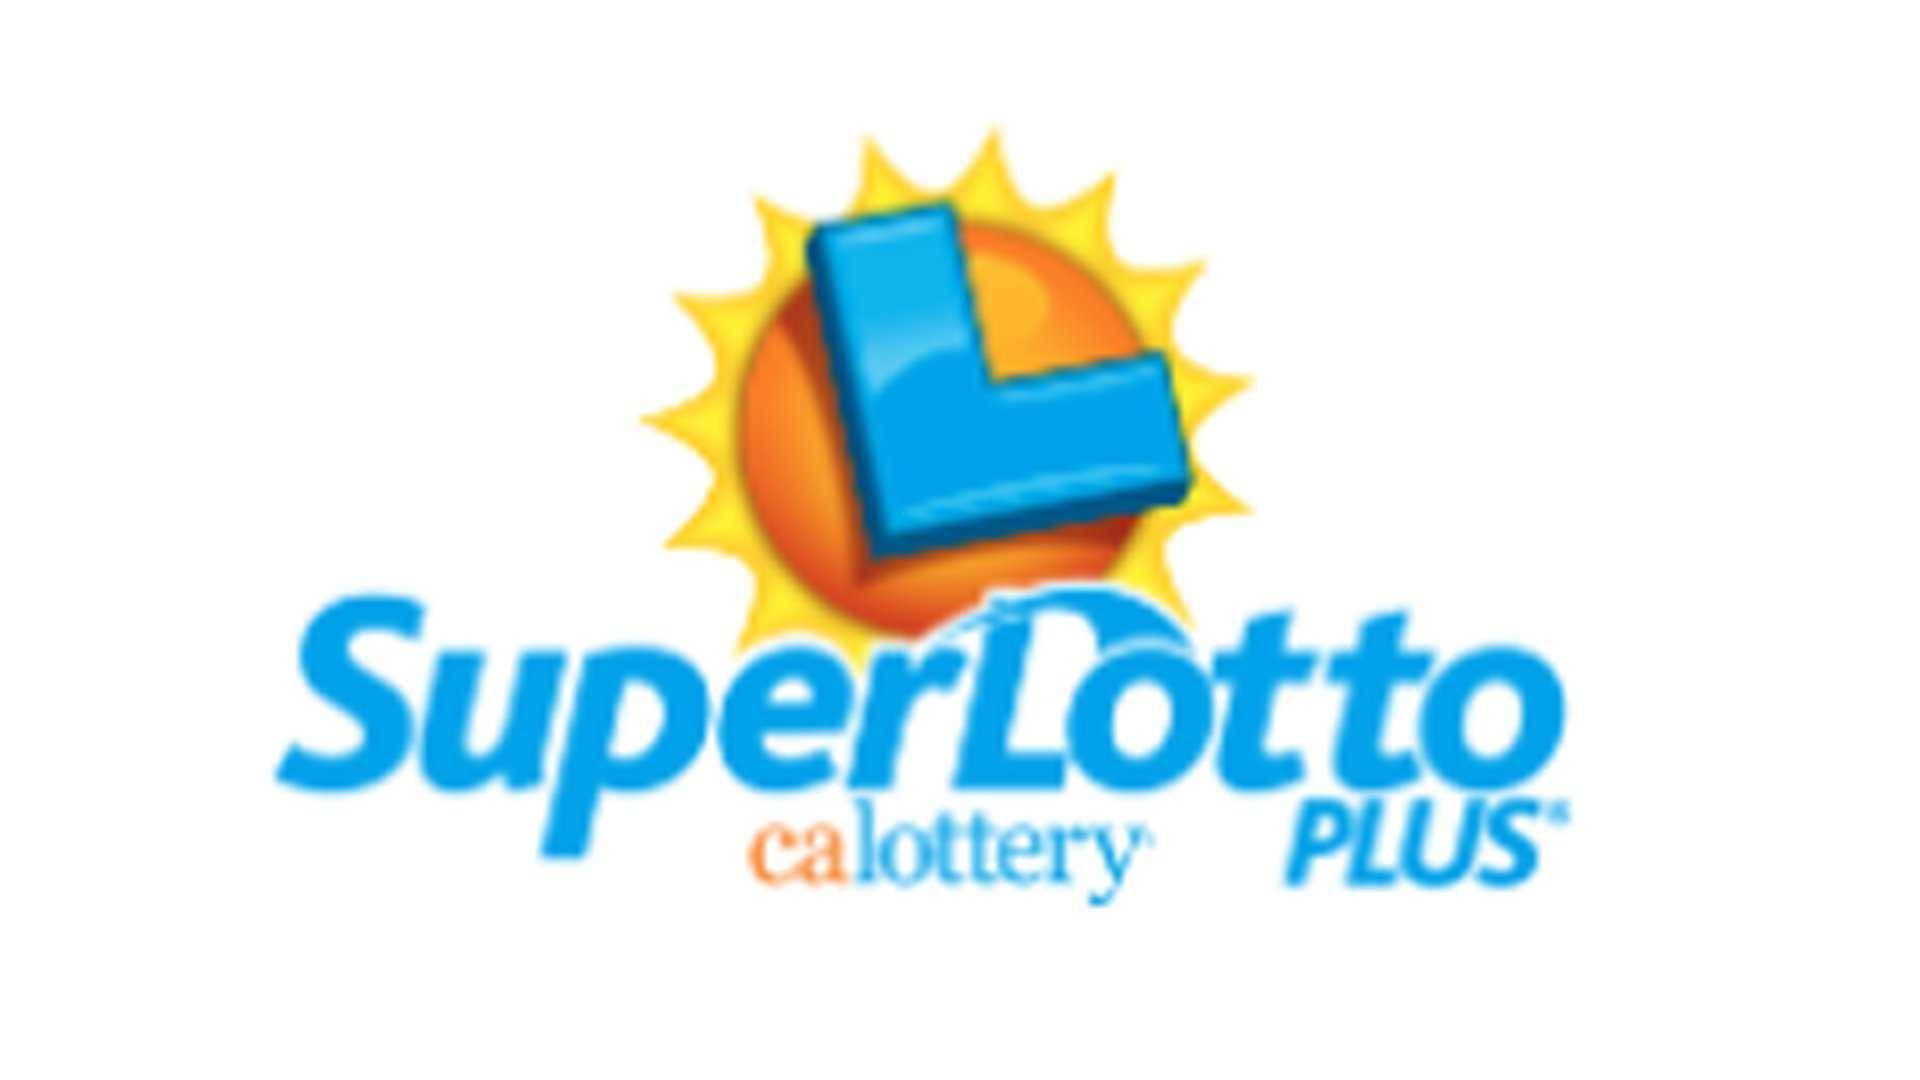 Super лото – суперлото с высокими шансами на победу